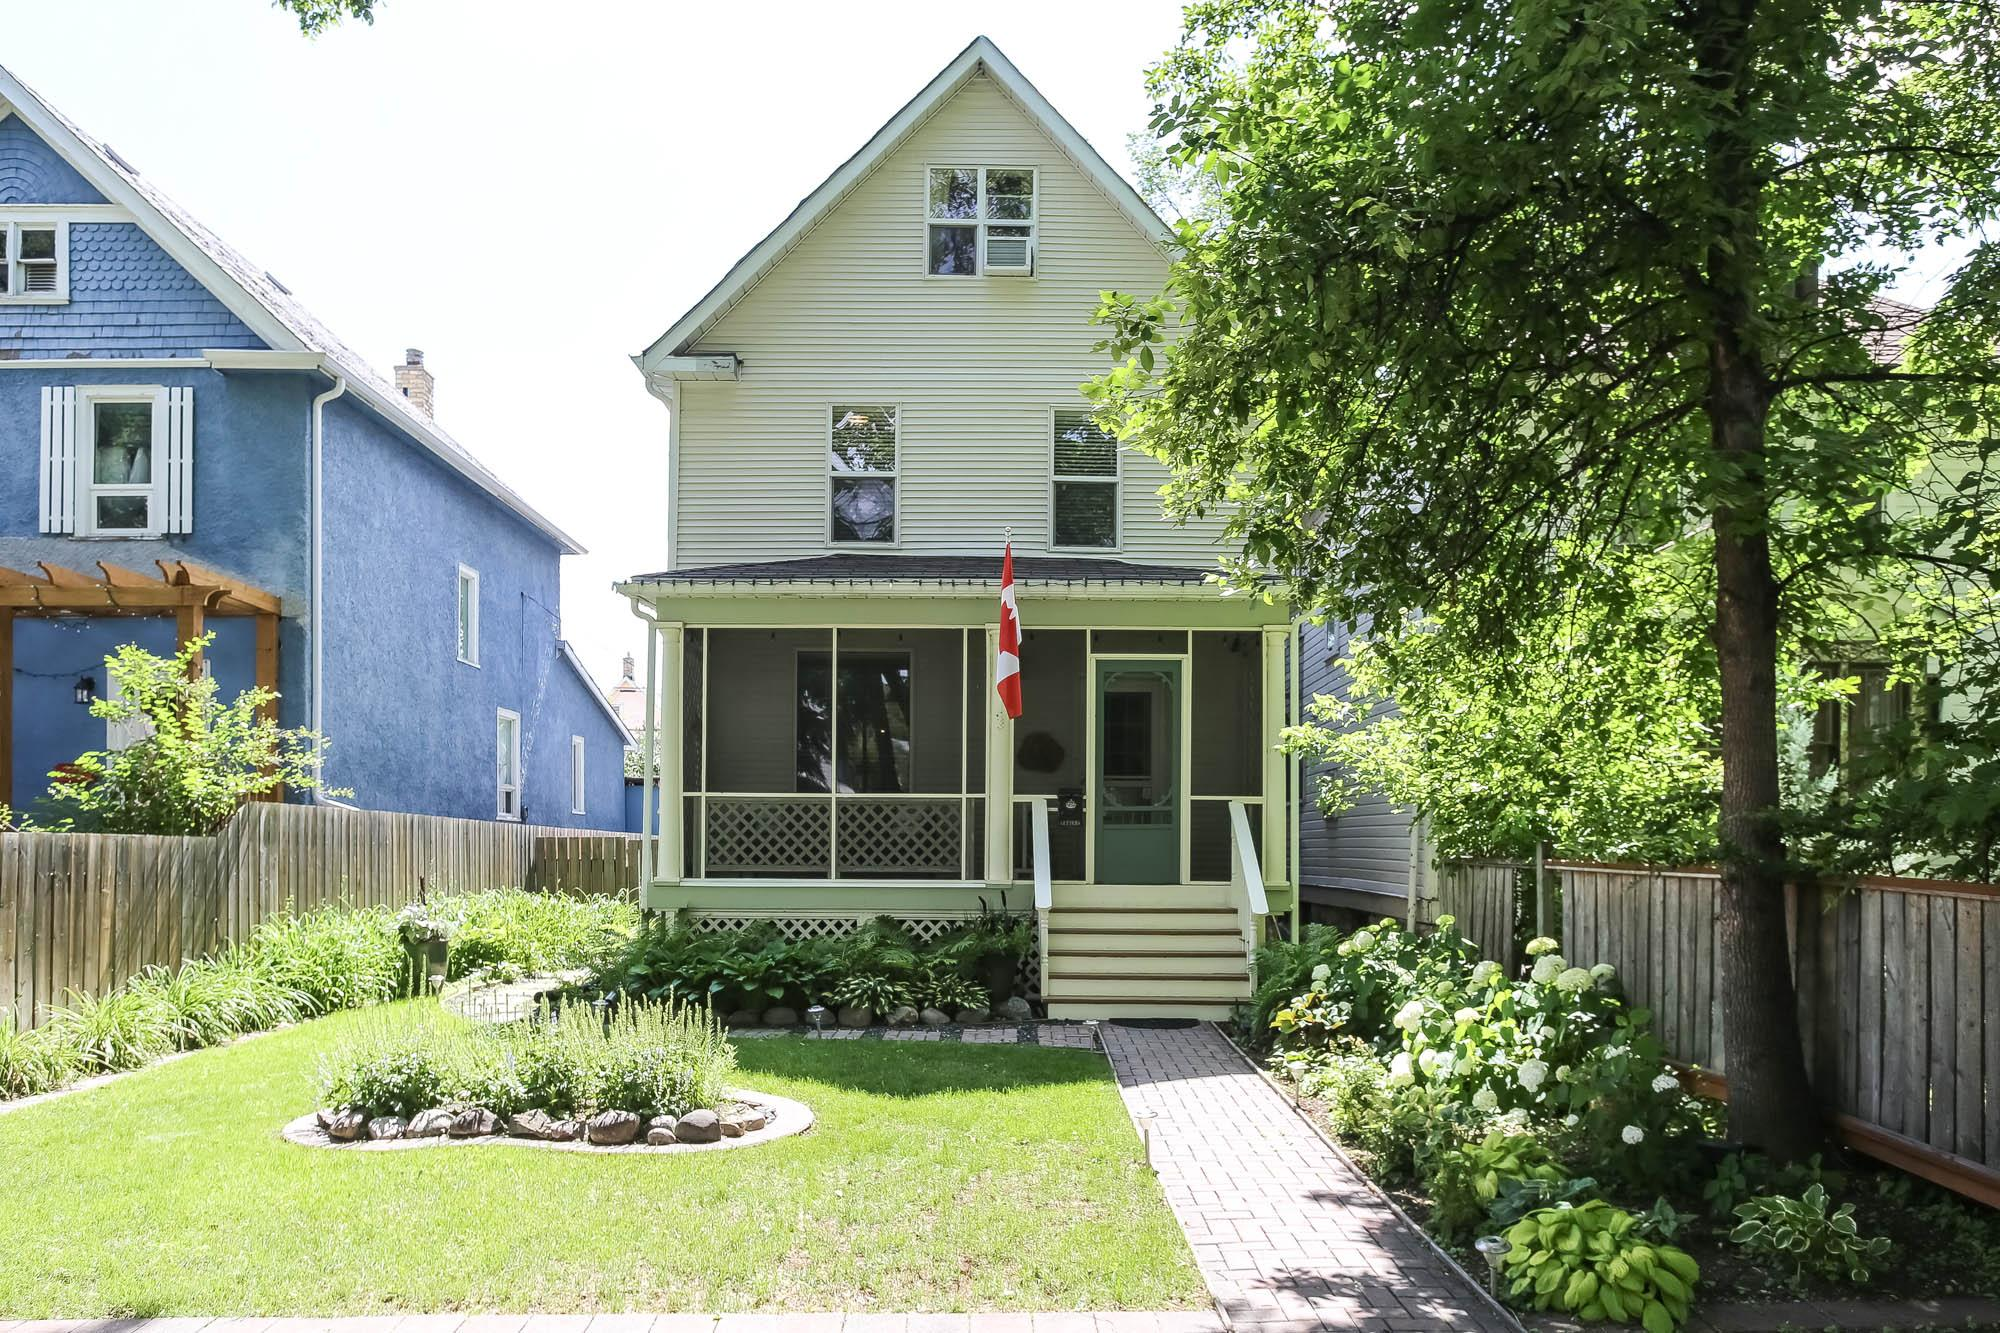 612 Mcmillan Ave, Winnipeg, Manitoba  R3L 0N6 - Photo 30 - 202017250